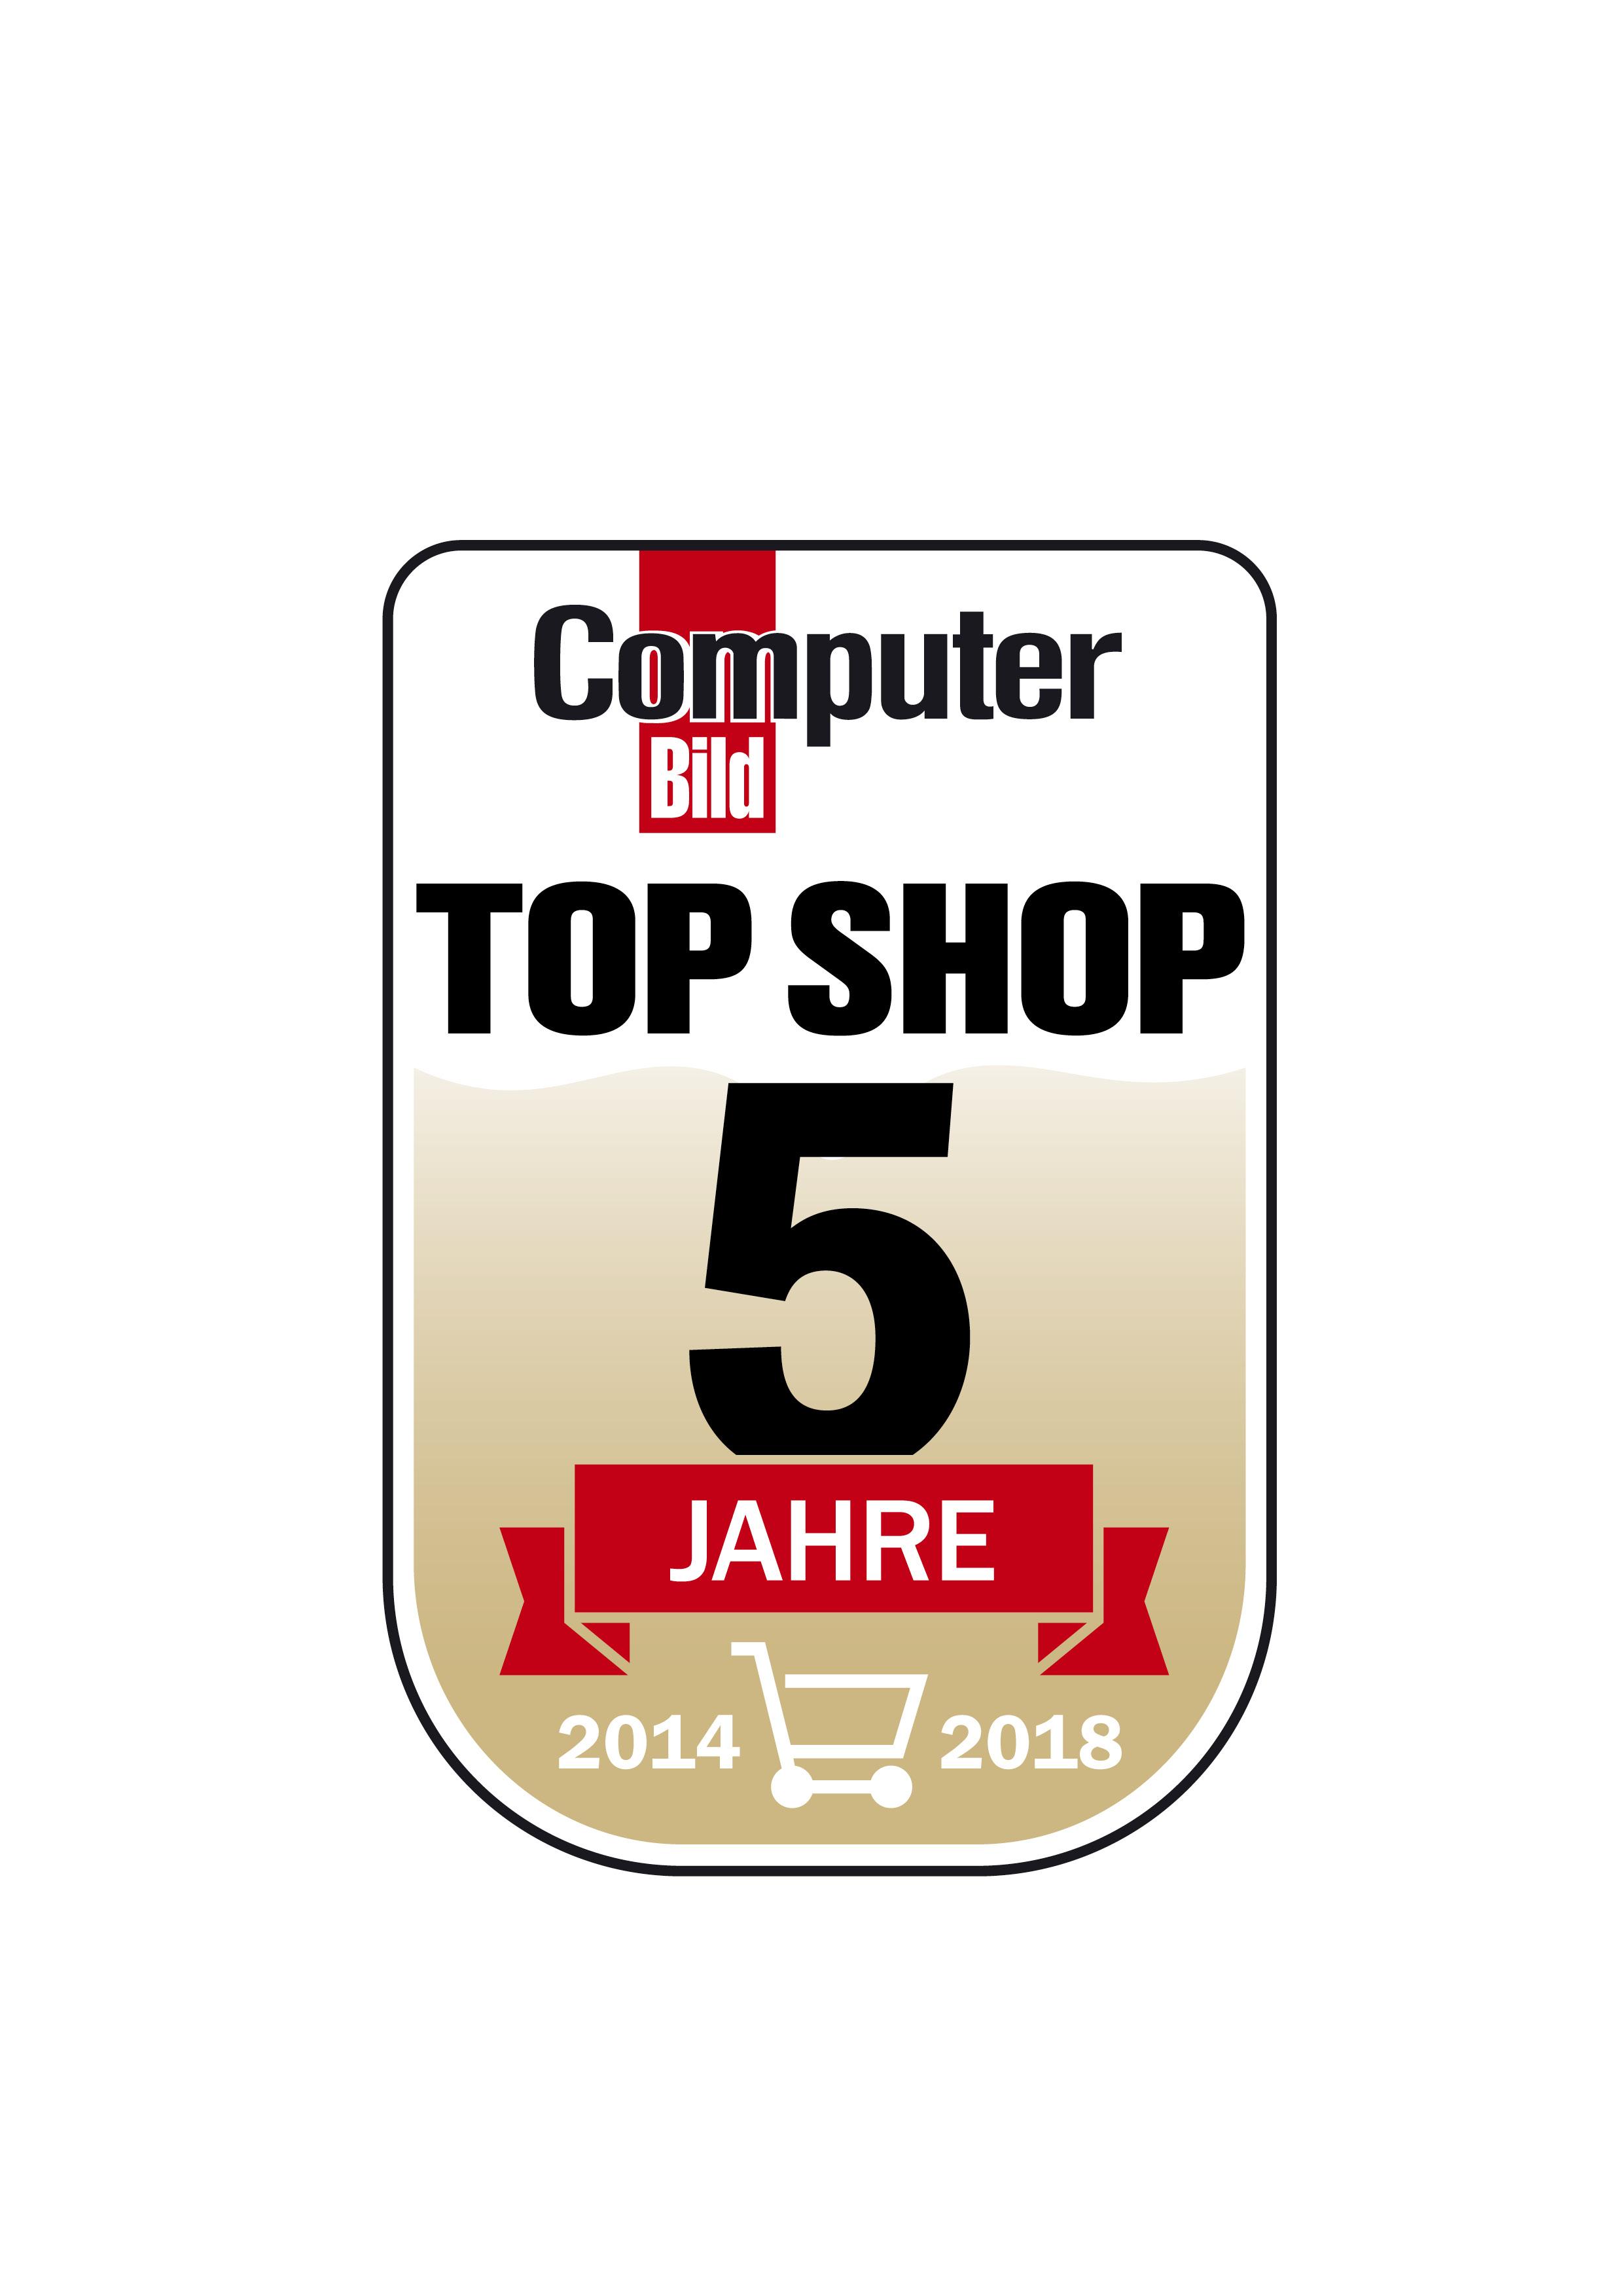 Top Shop Logo Jubiläum